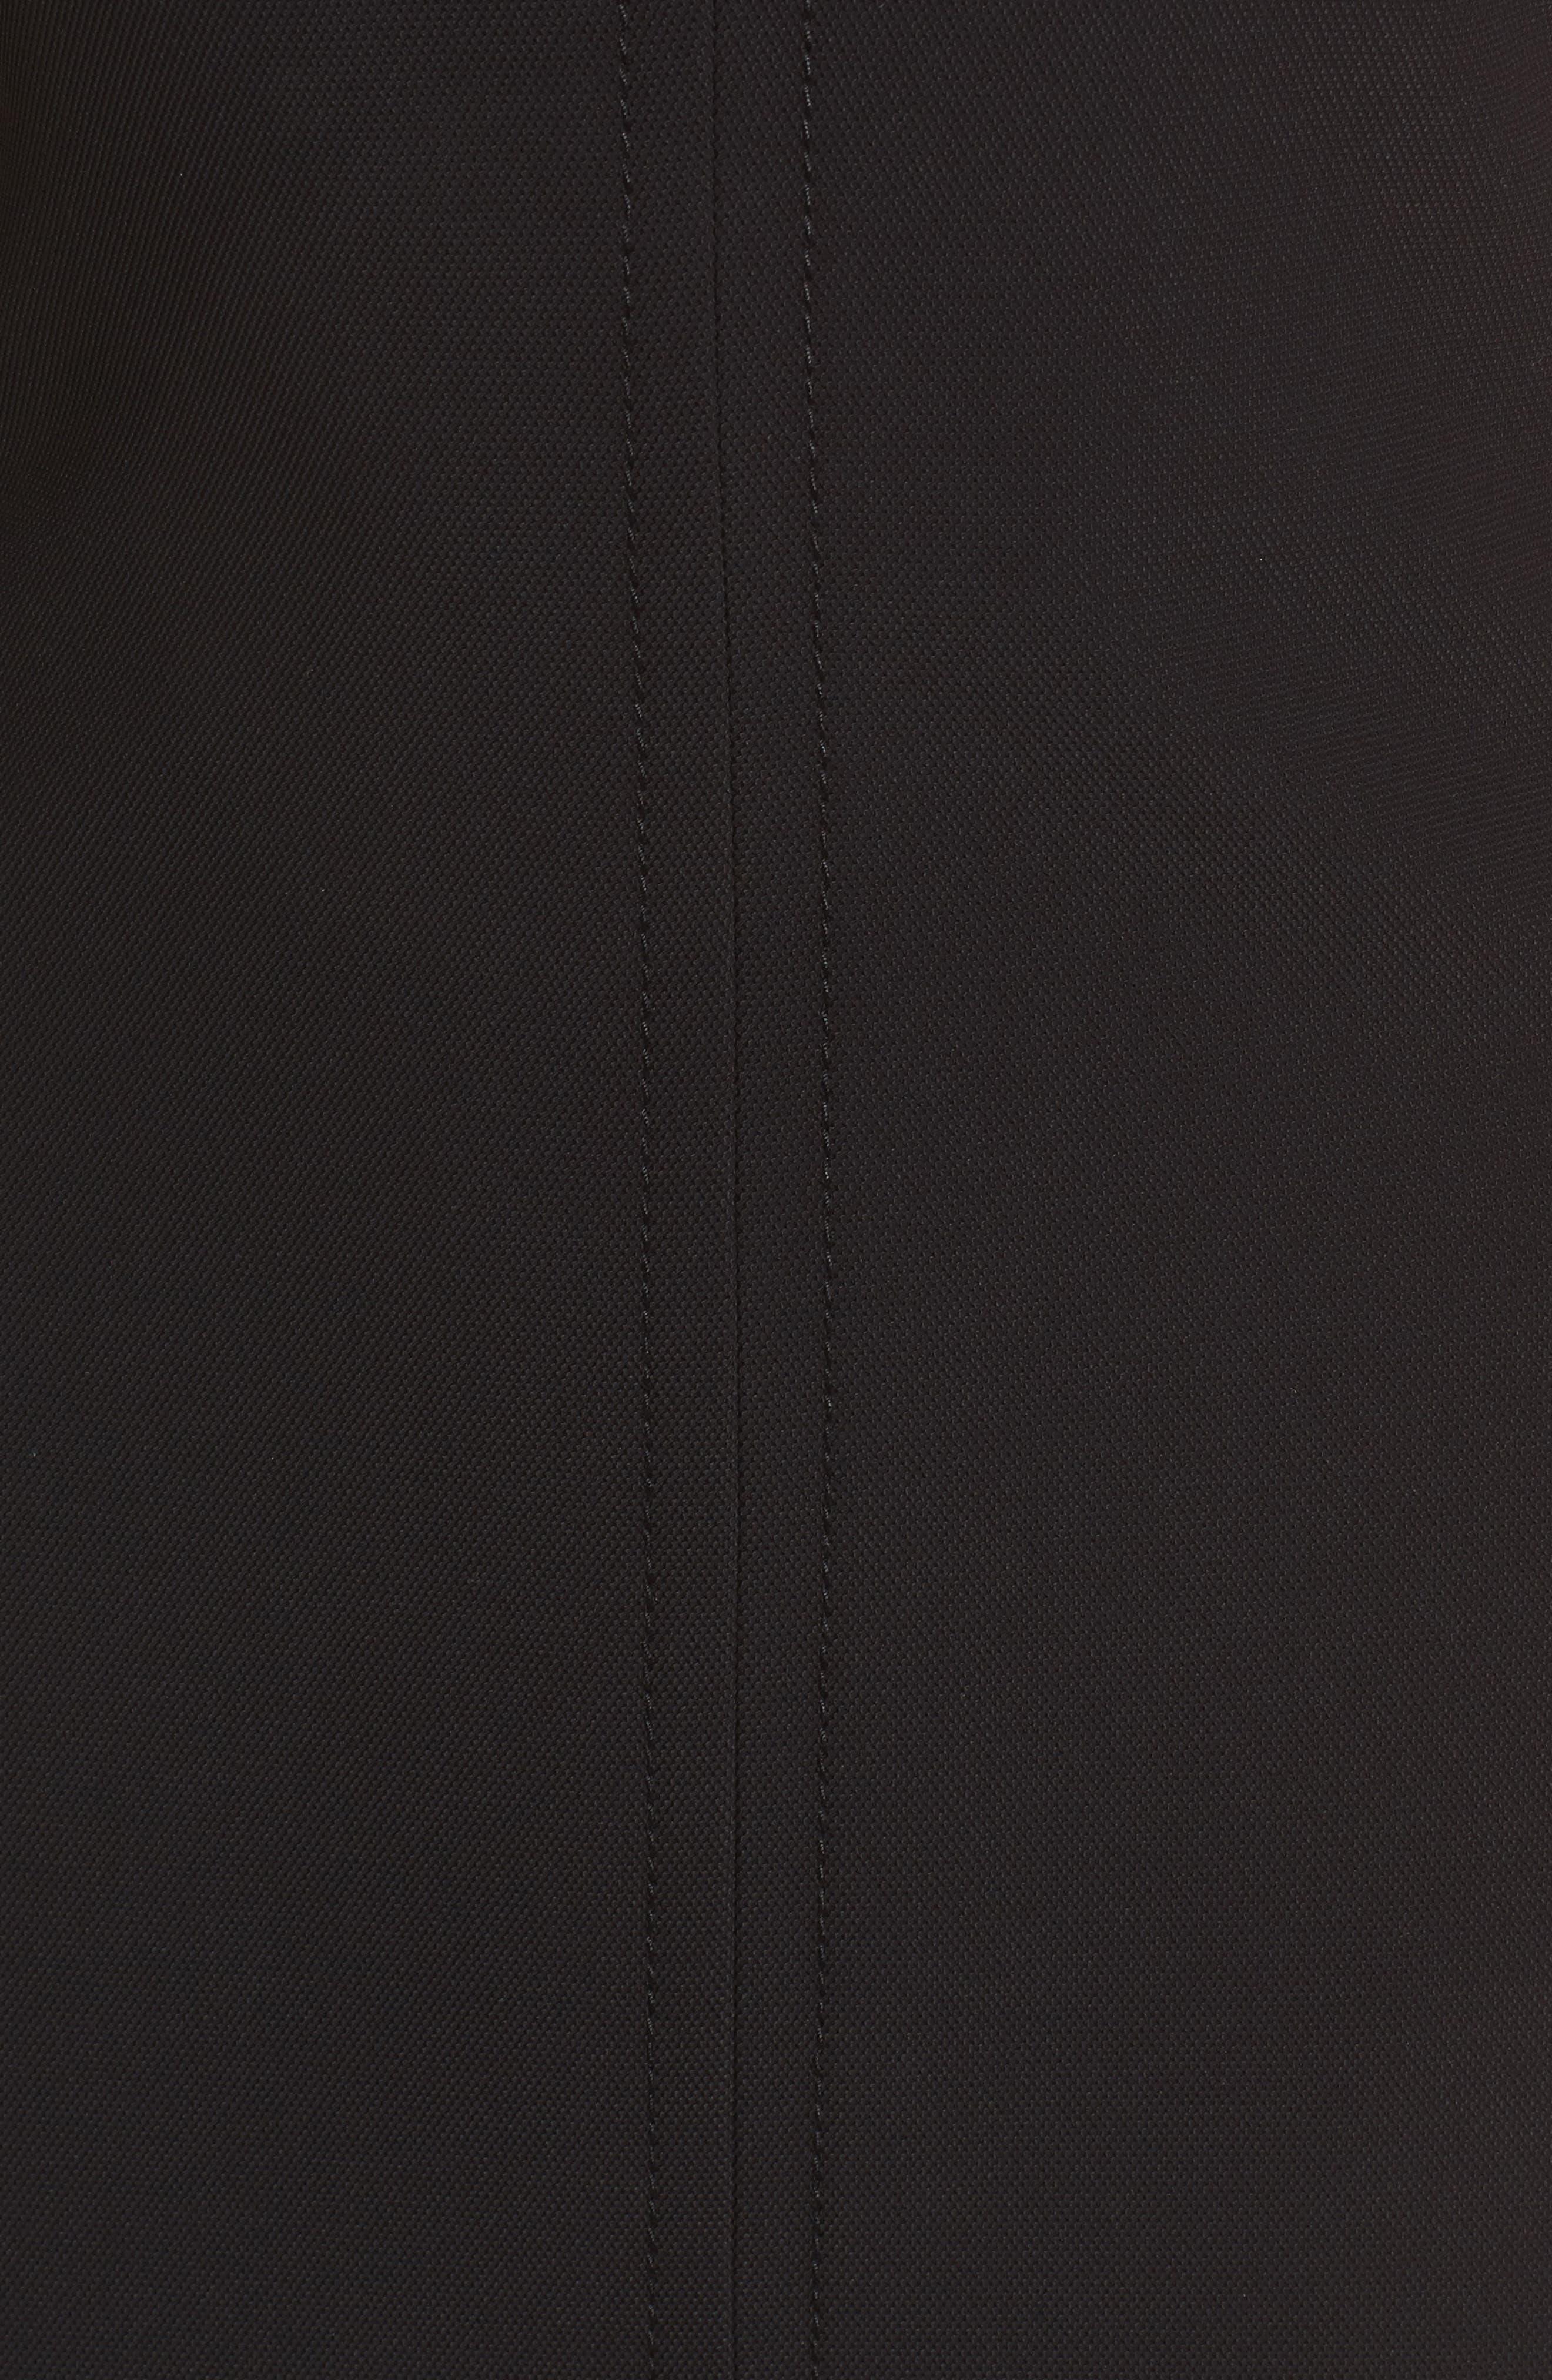 Dilamena Crepe Sheath Dress,                             Alternate thumbnail 5, color,                             001